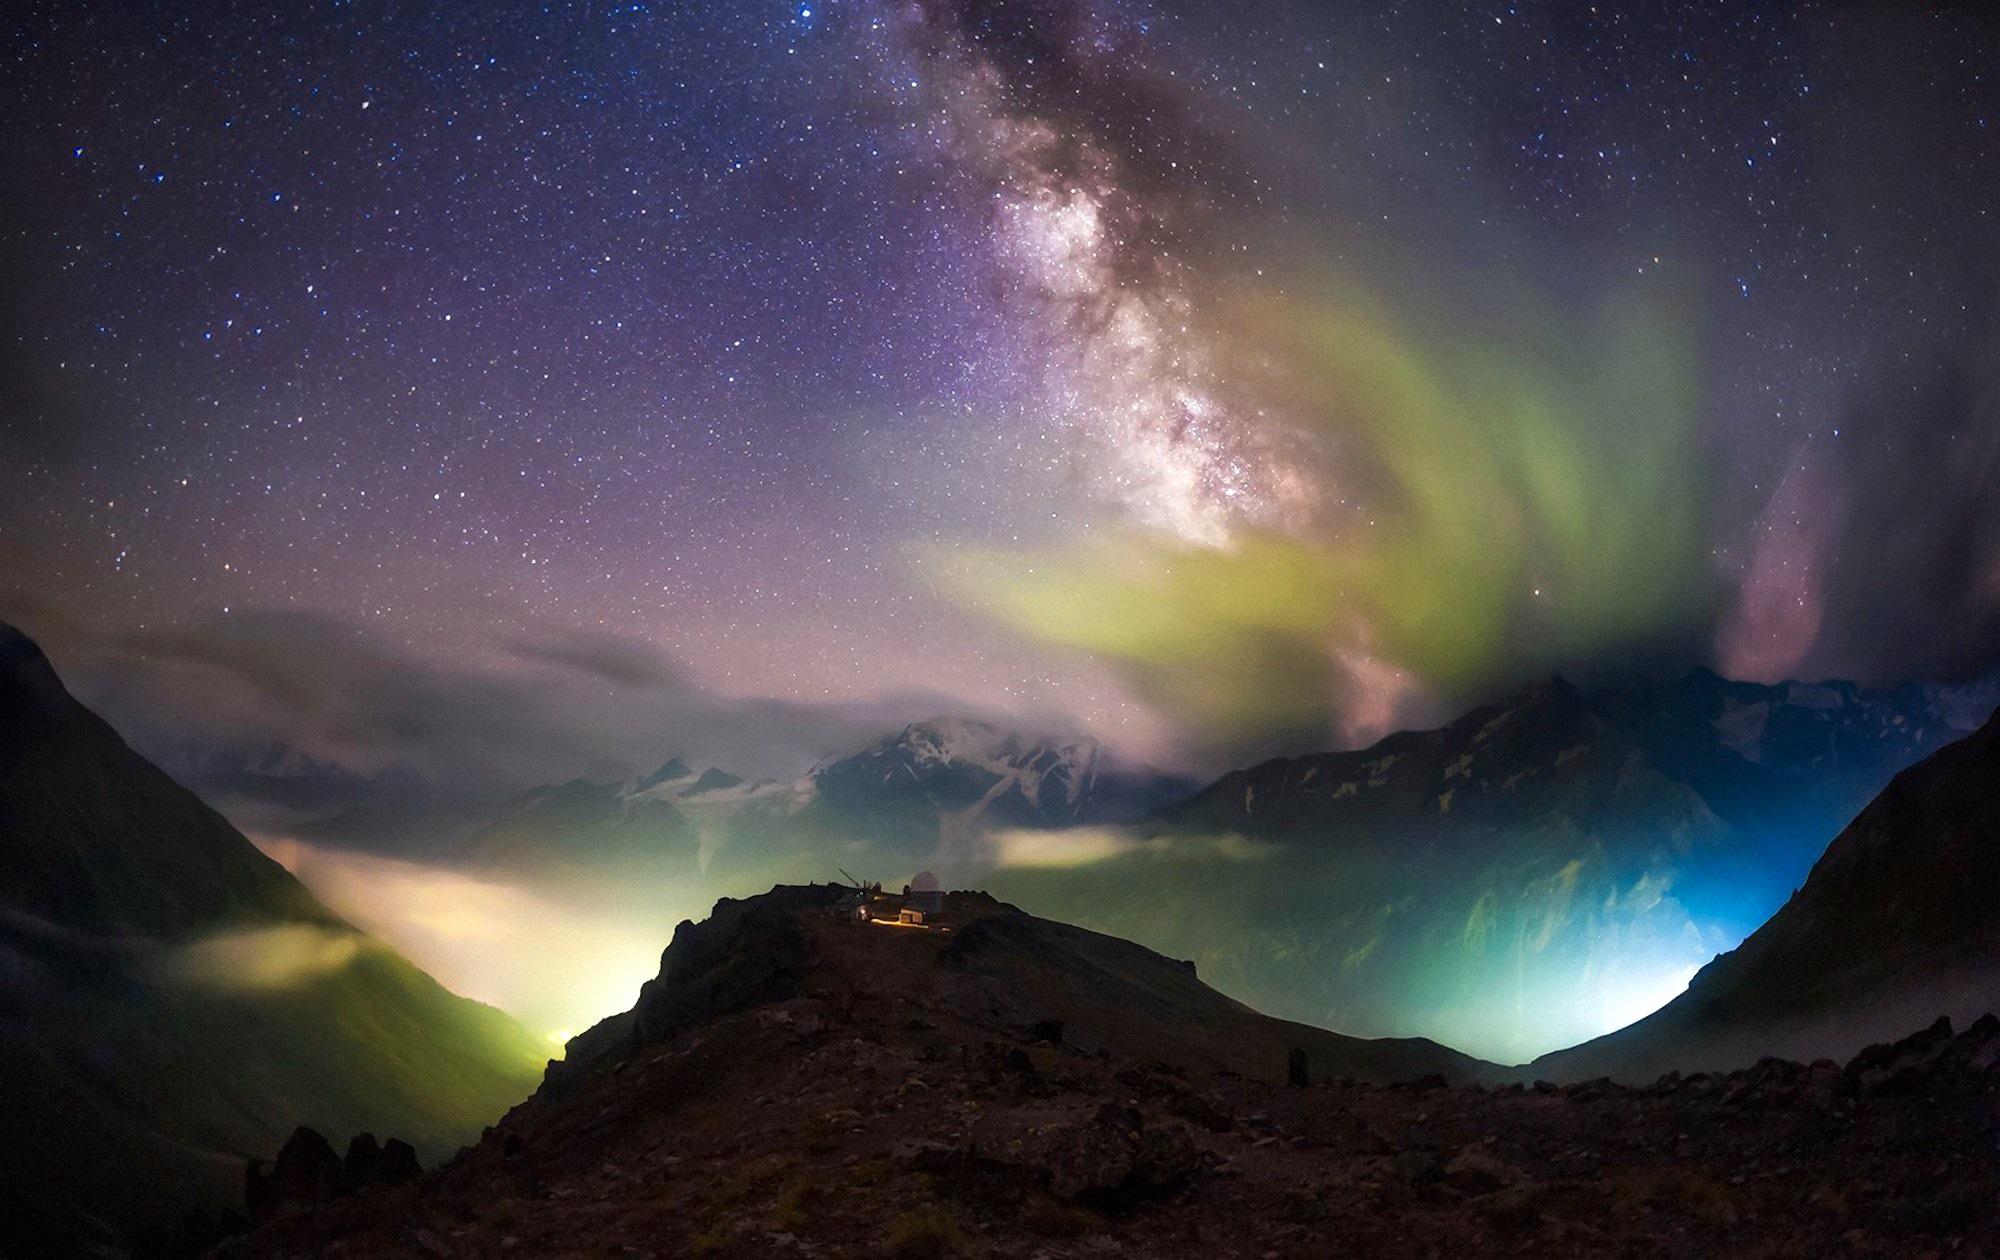 00 Yevgeni Trisko. Peak Terskol Observatory in Kabardino-Balkaria (Russia). 2015